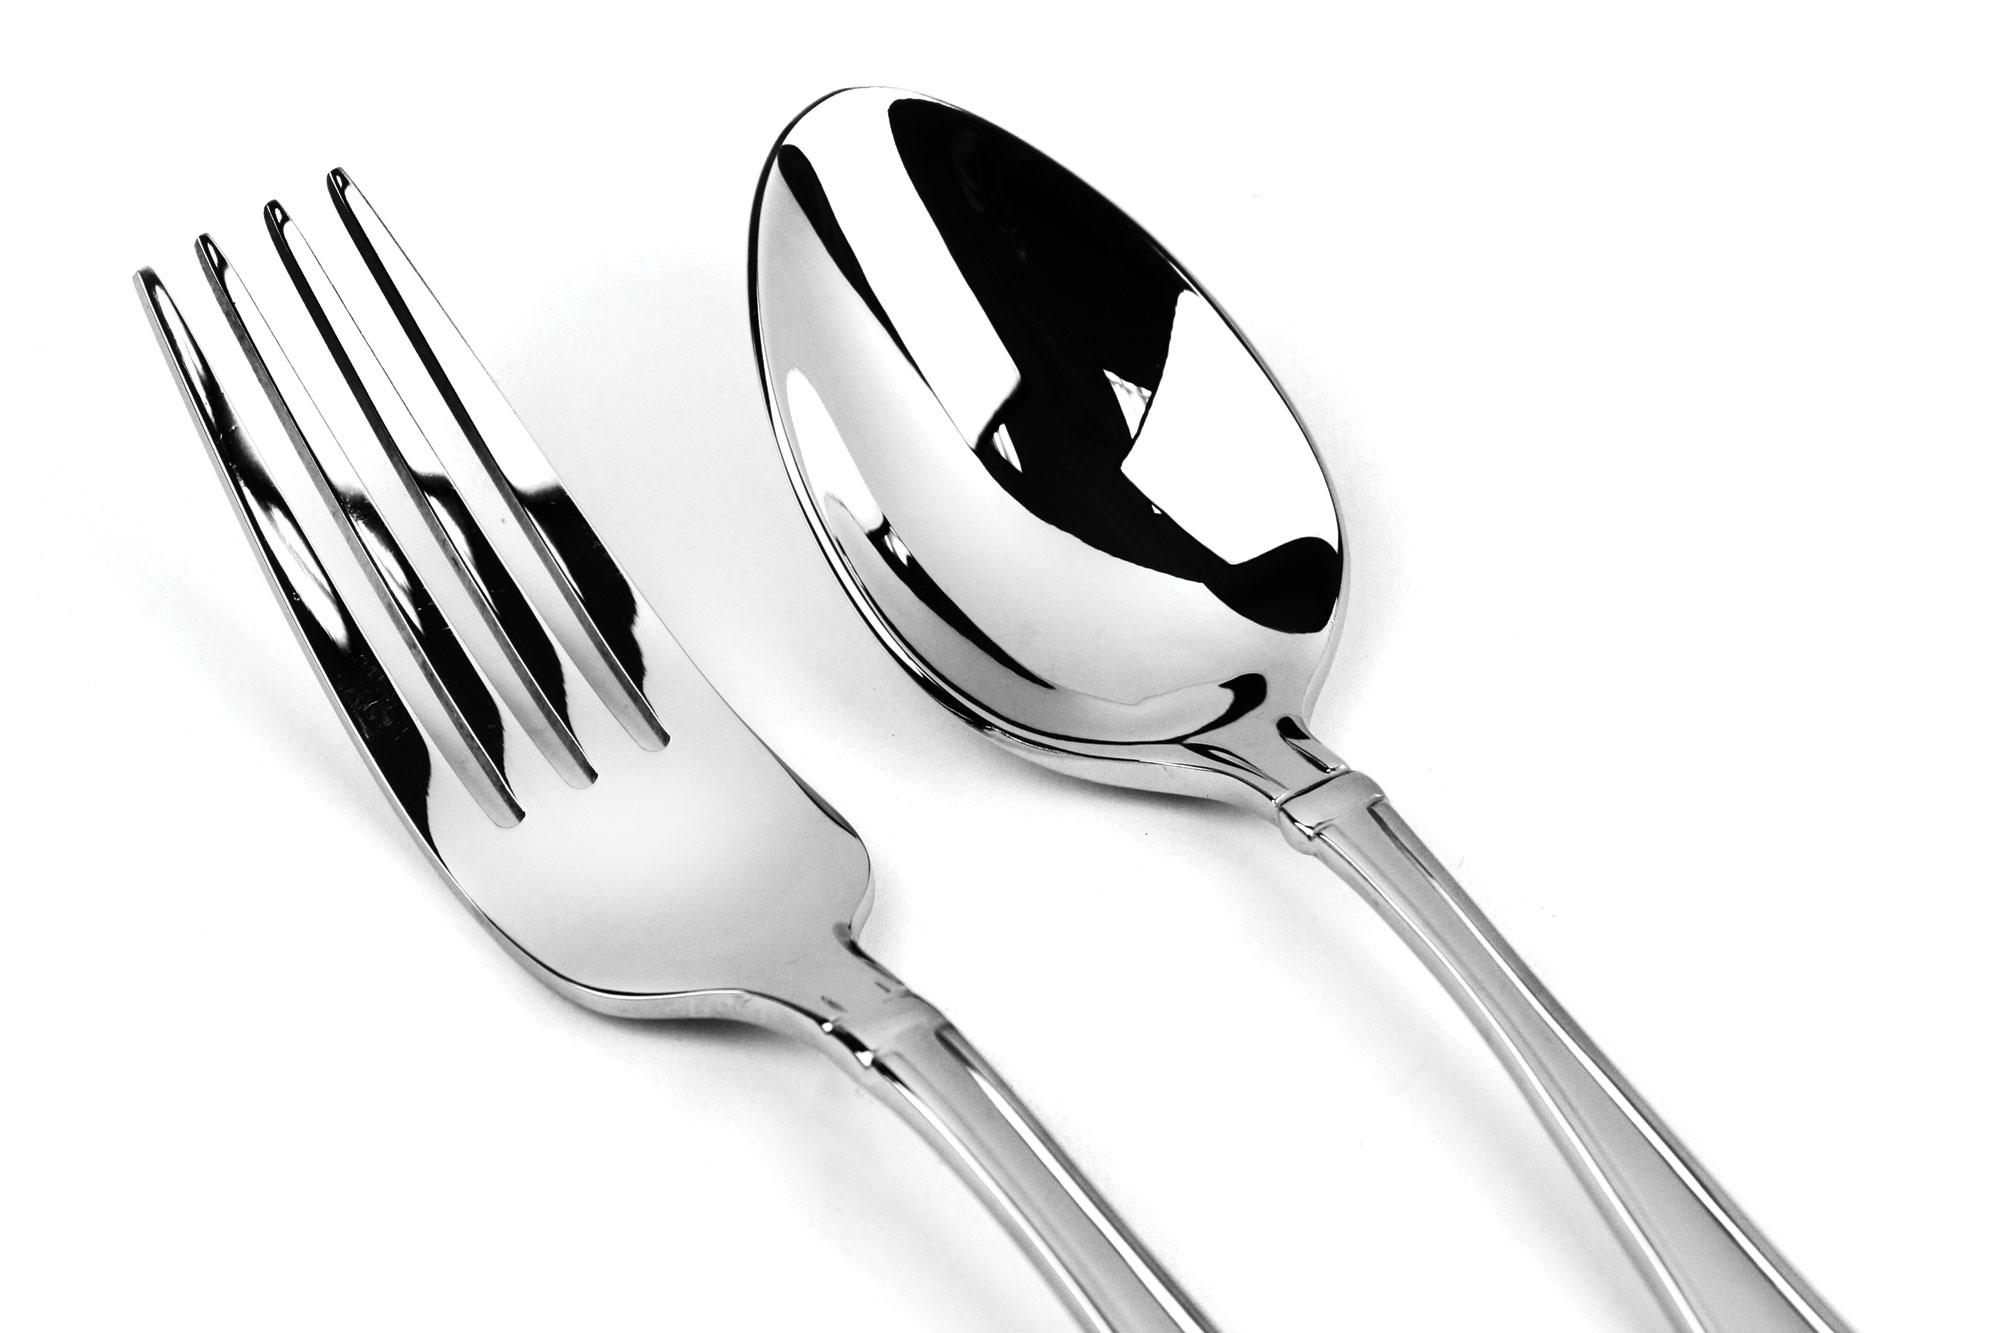 Oneida Satin Garnet Stainless Steel Flatware Set 65 Piece